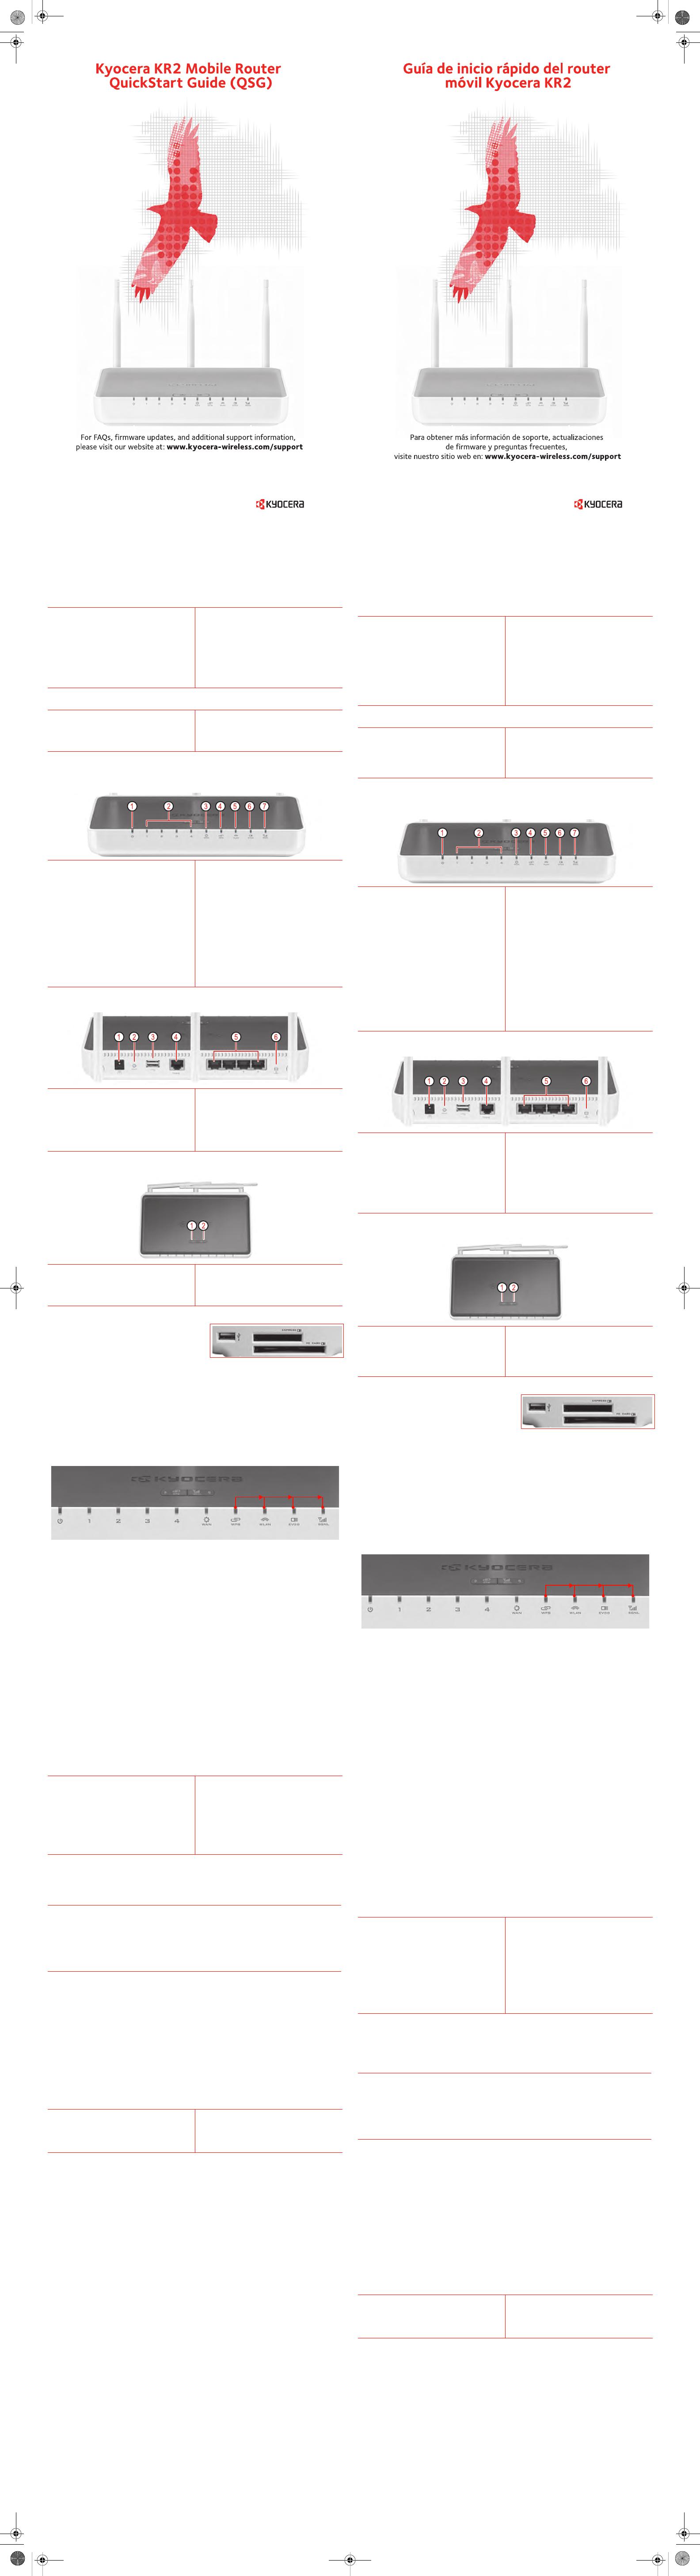 Kyocera TXRTR10012 Kyocera KR2 Mobile Router User Manual 82